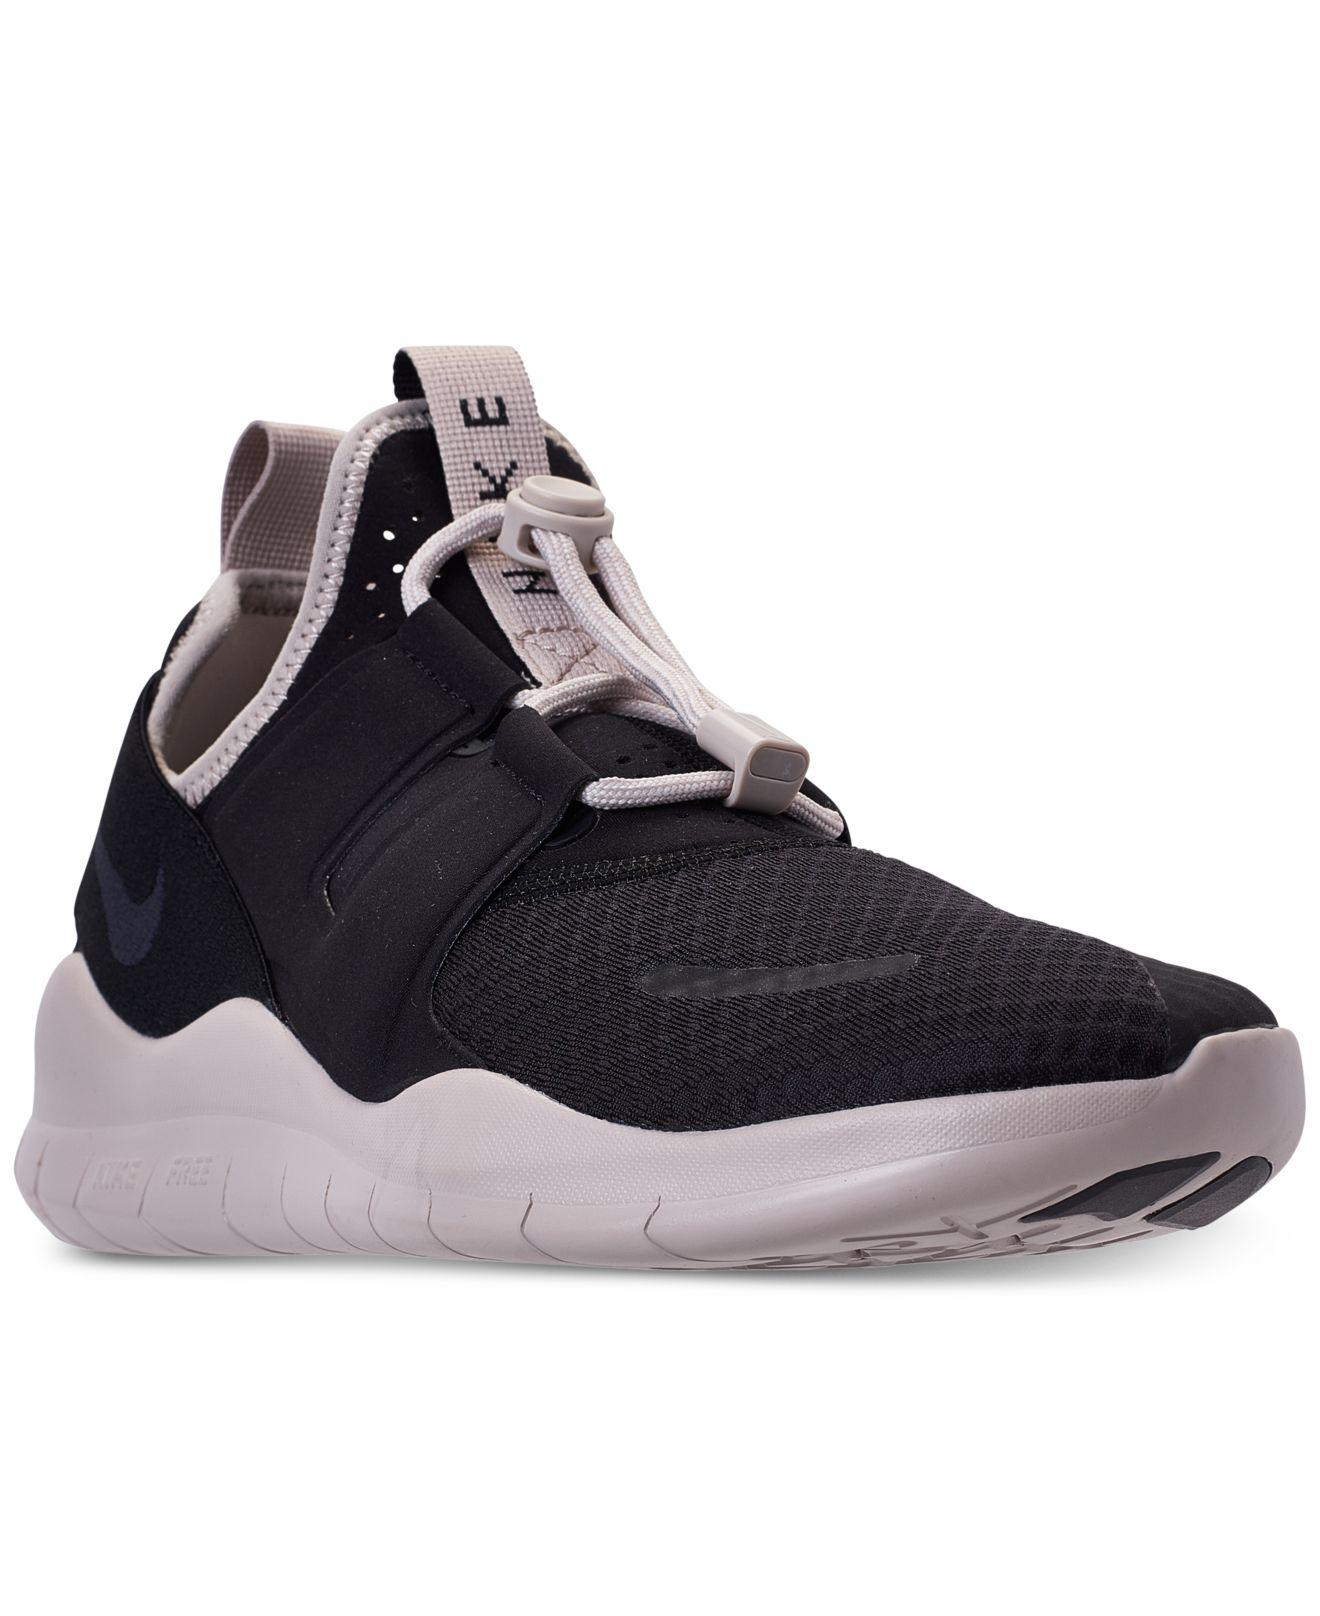 7193e605cc6b ... running shoes 08ef5 b5bad  norway nike. mens black free rn 783d1 81e41